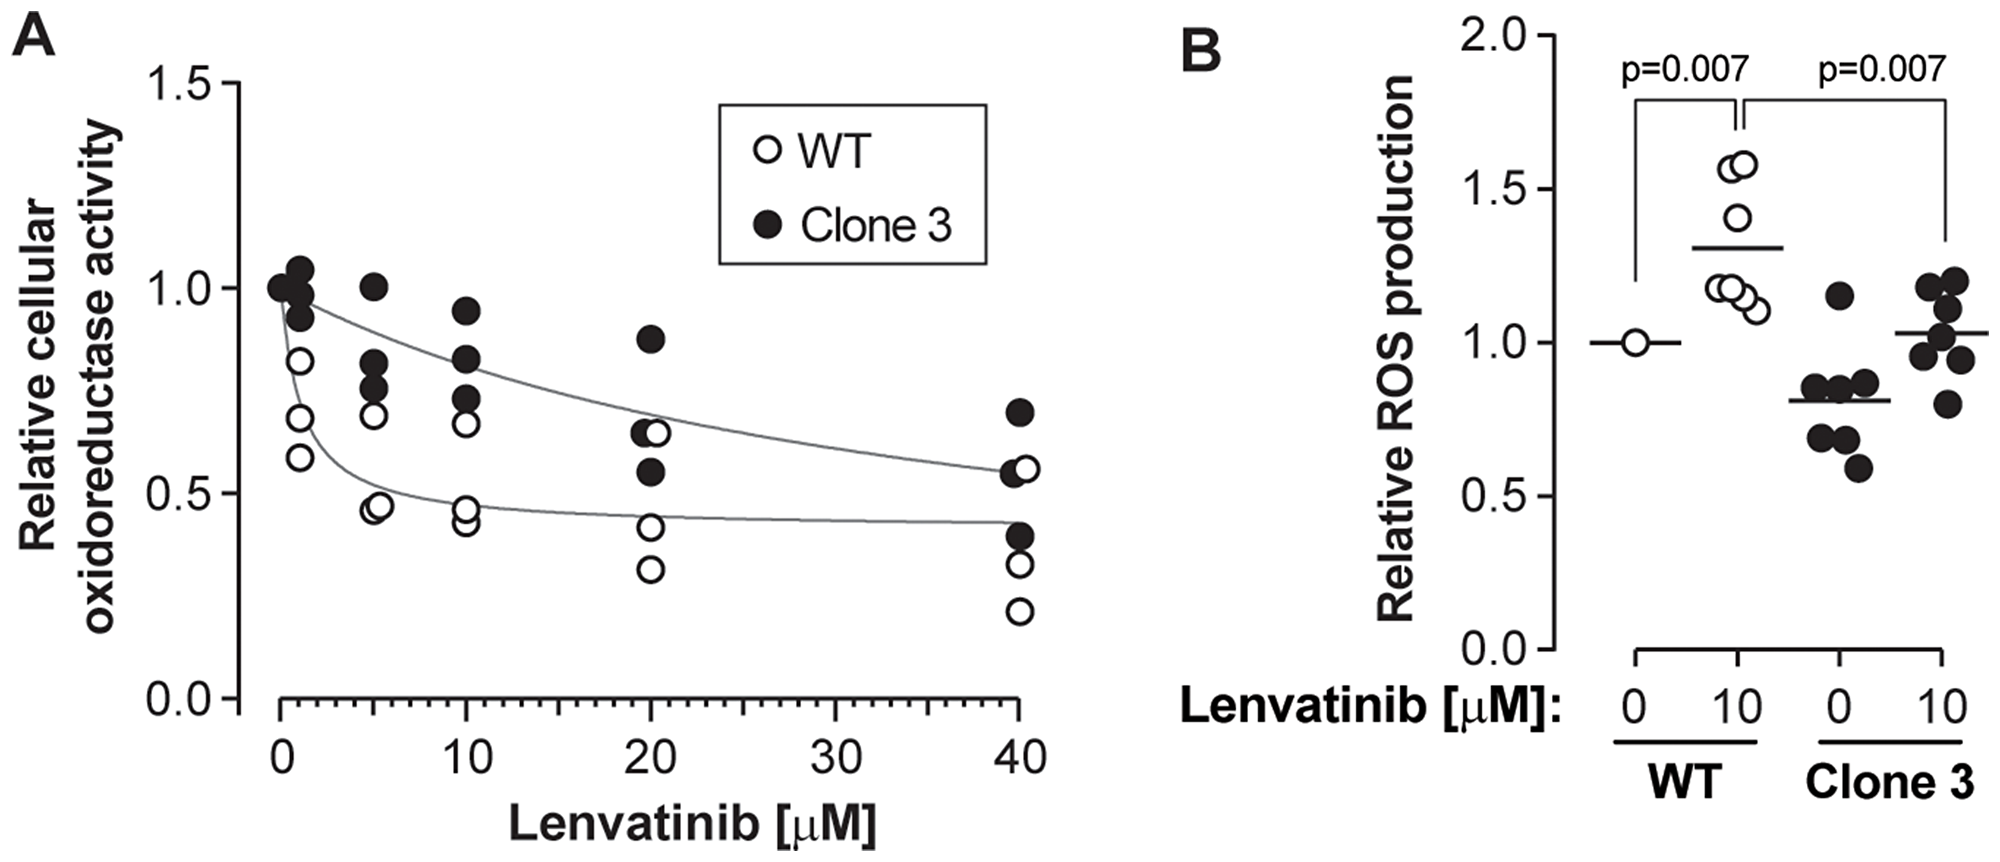 KEAP1 disruption confers resistance to lenvatinib.